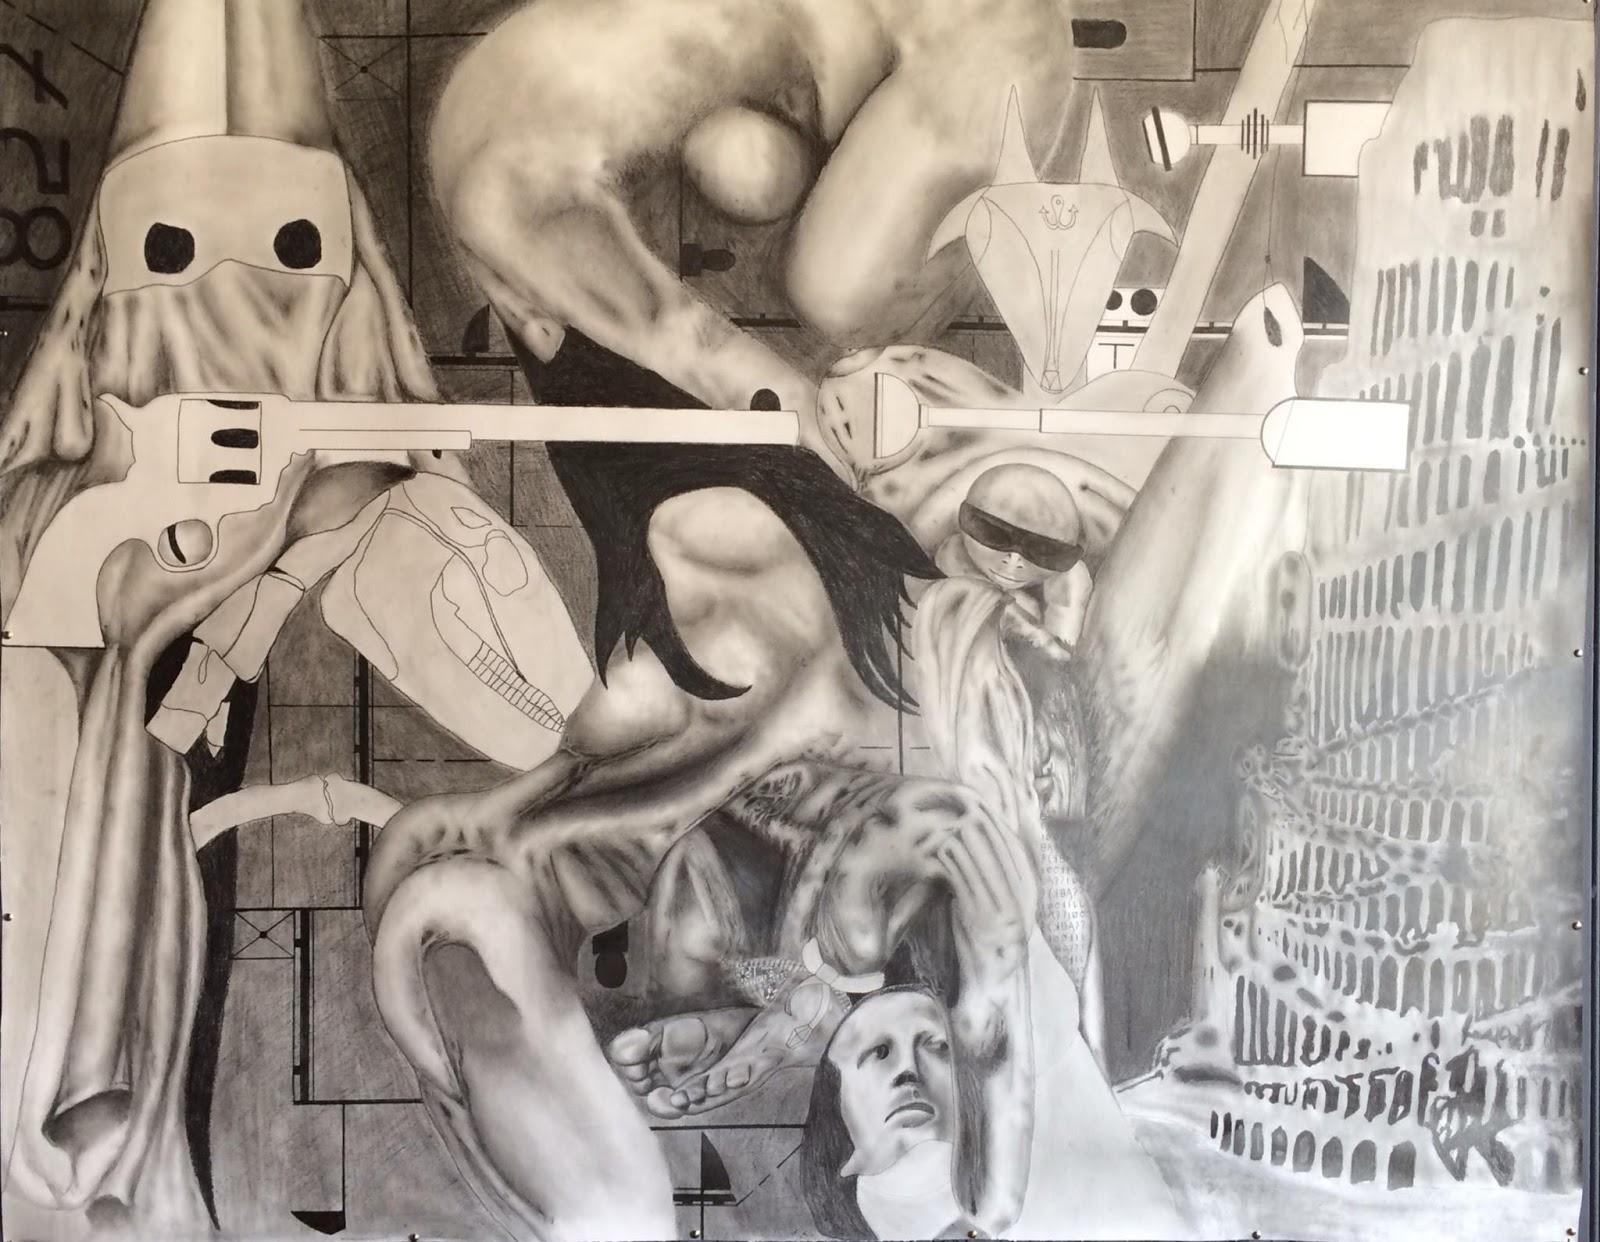 Baker, Miller, Pink - Spencer Reid   Nightshades 5 (2015), Graphite on Paper, 180 cm x 200 cm.